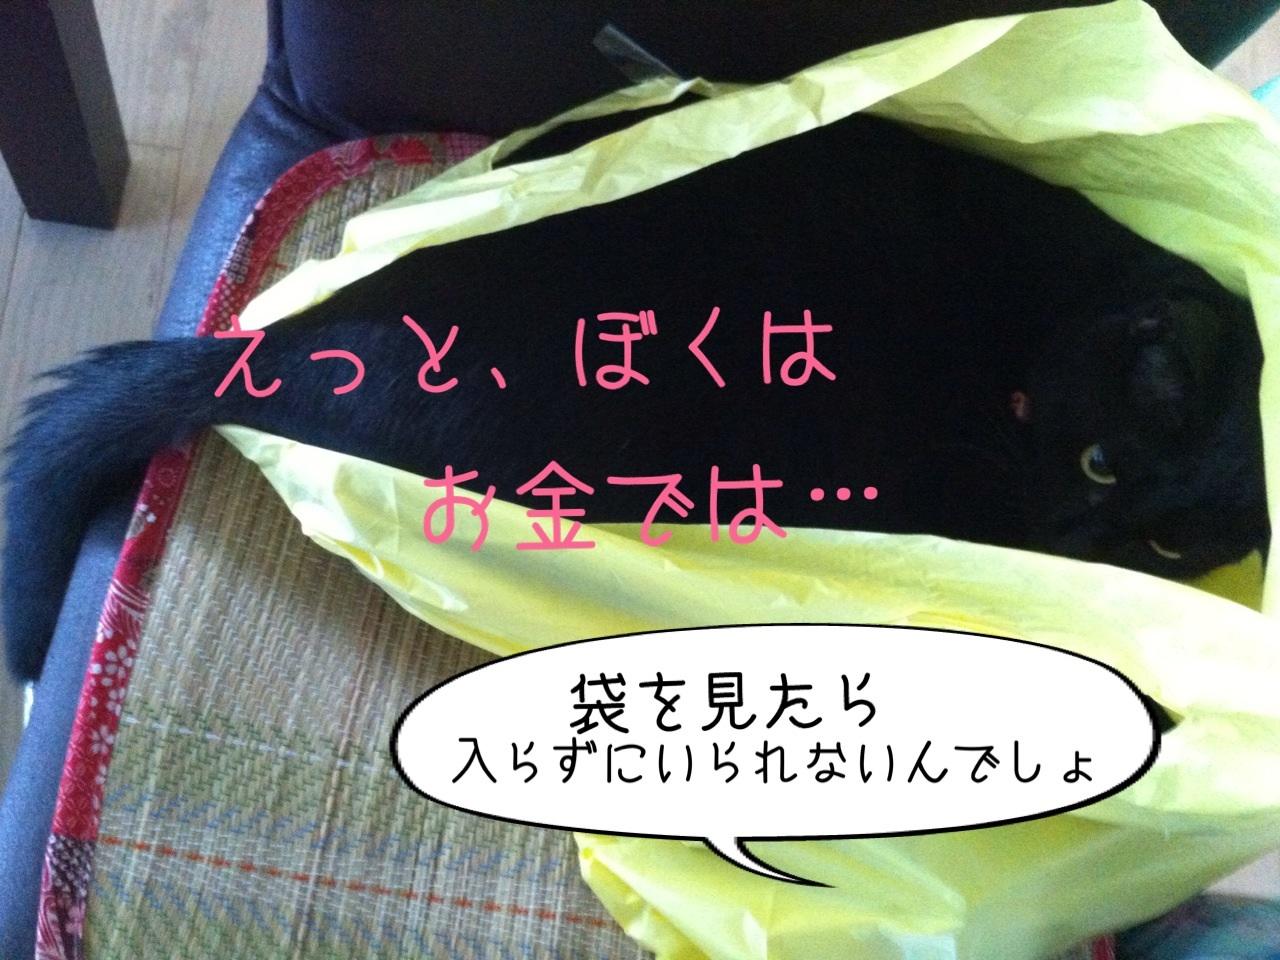 image_20130818194922f15.jpg